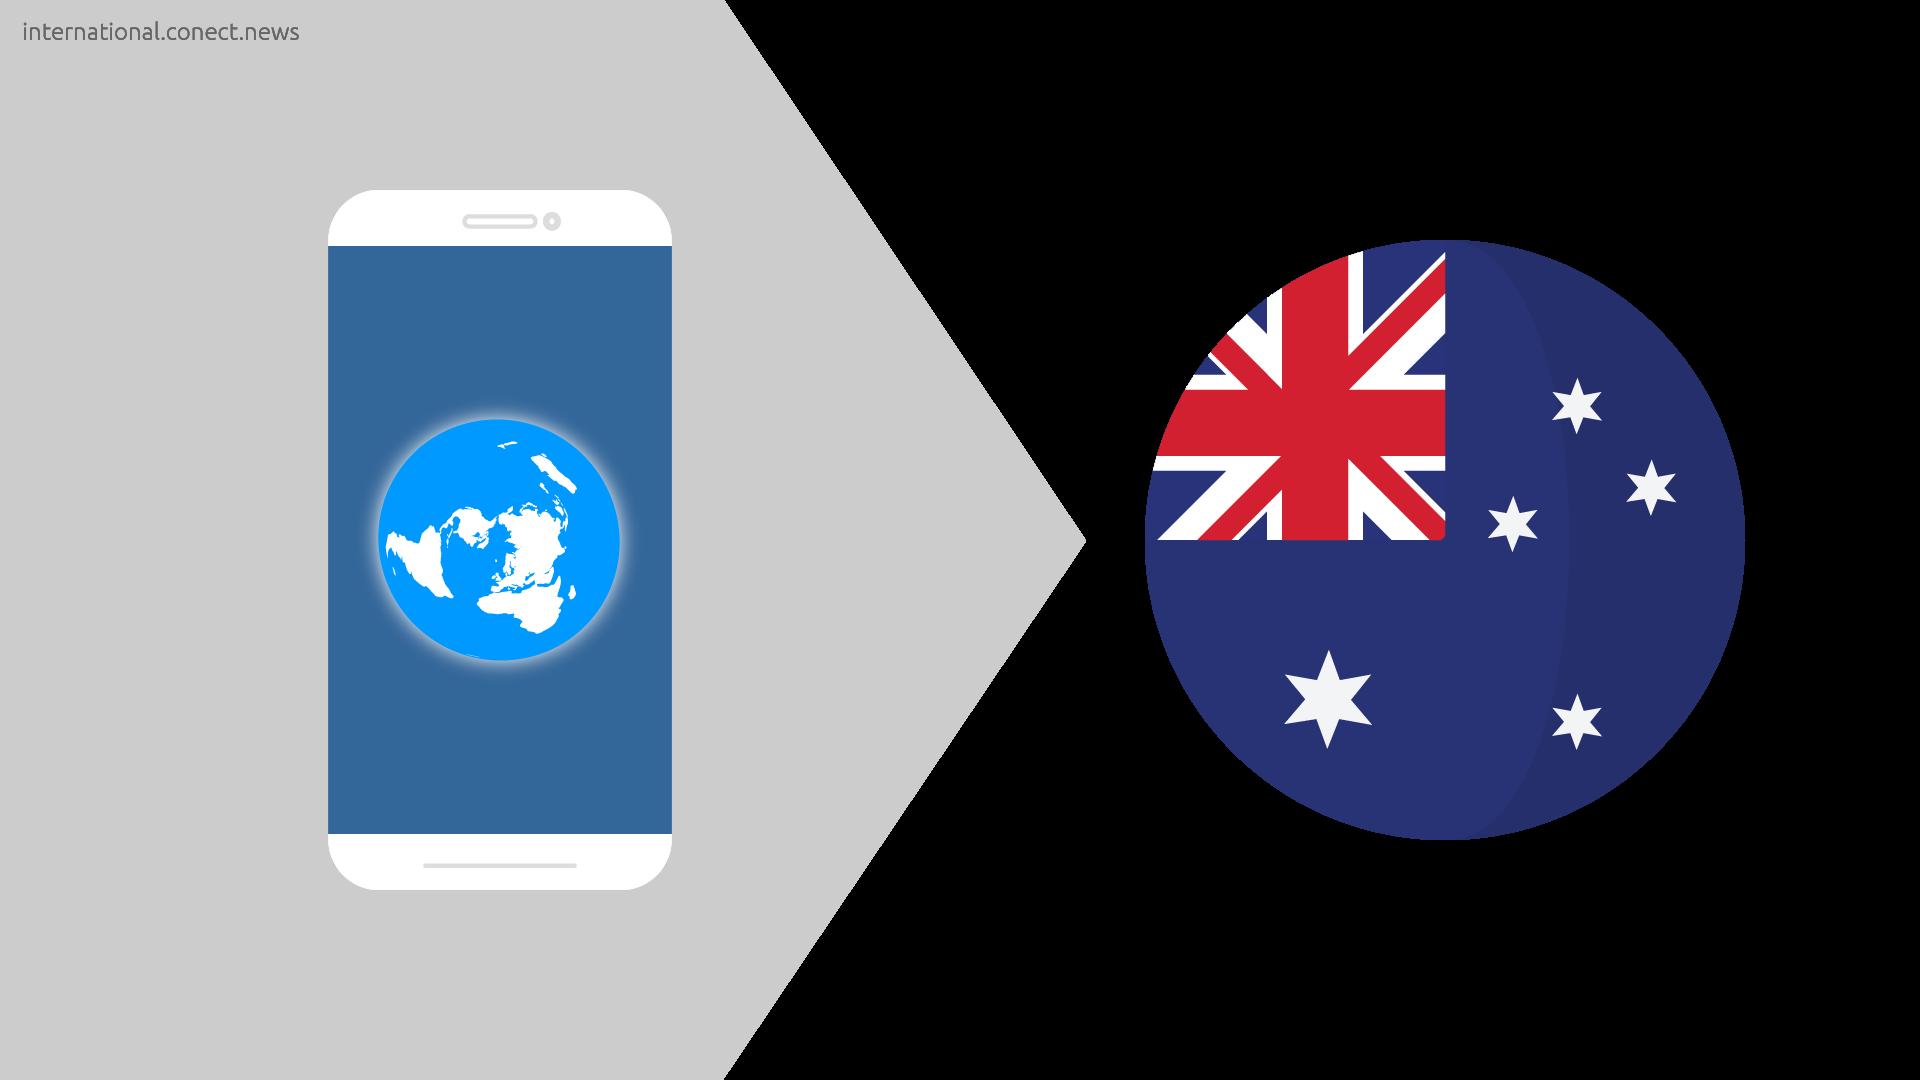 Calling Australia @conect_news